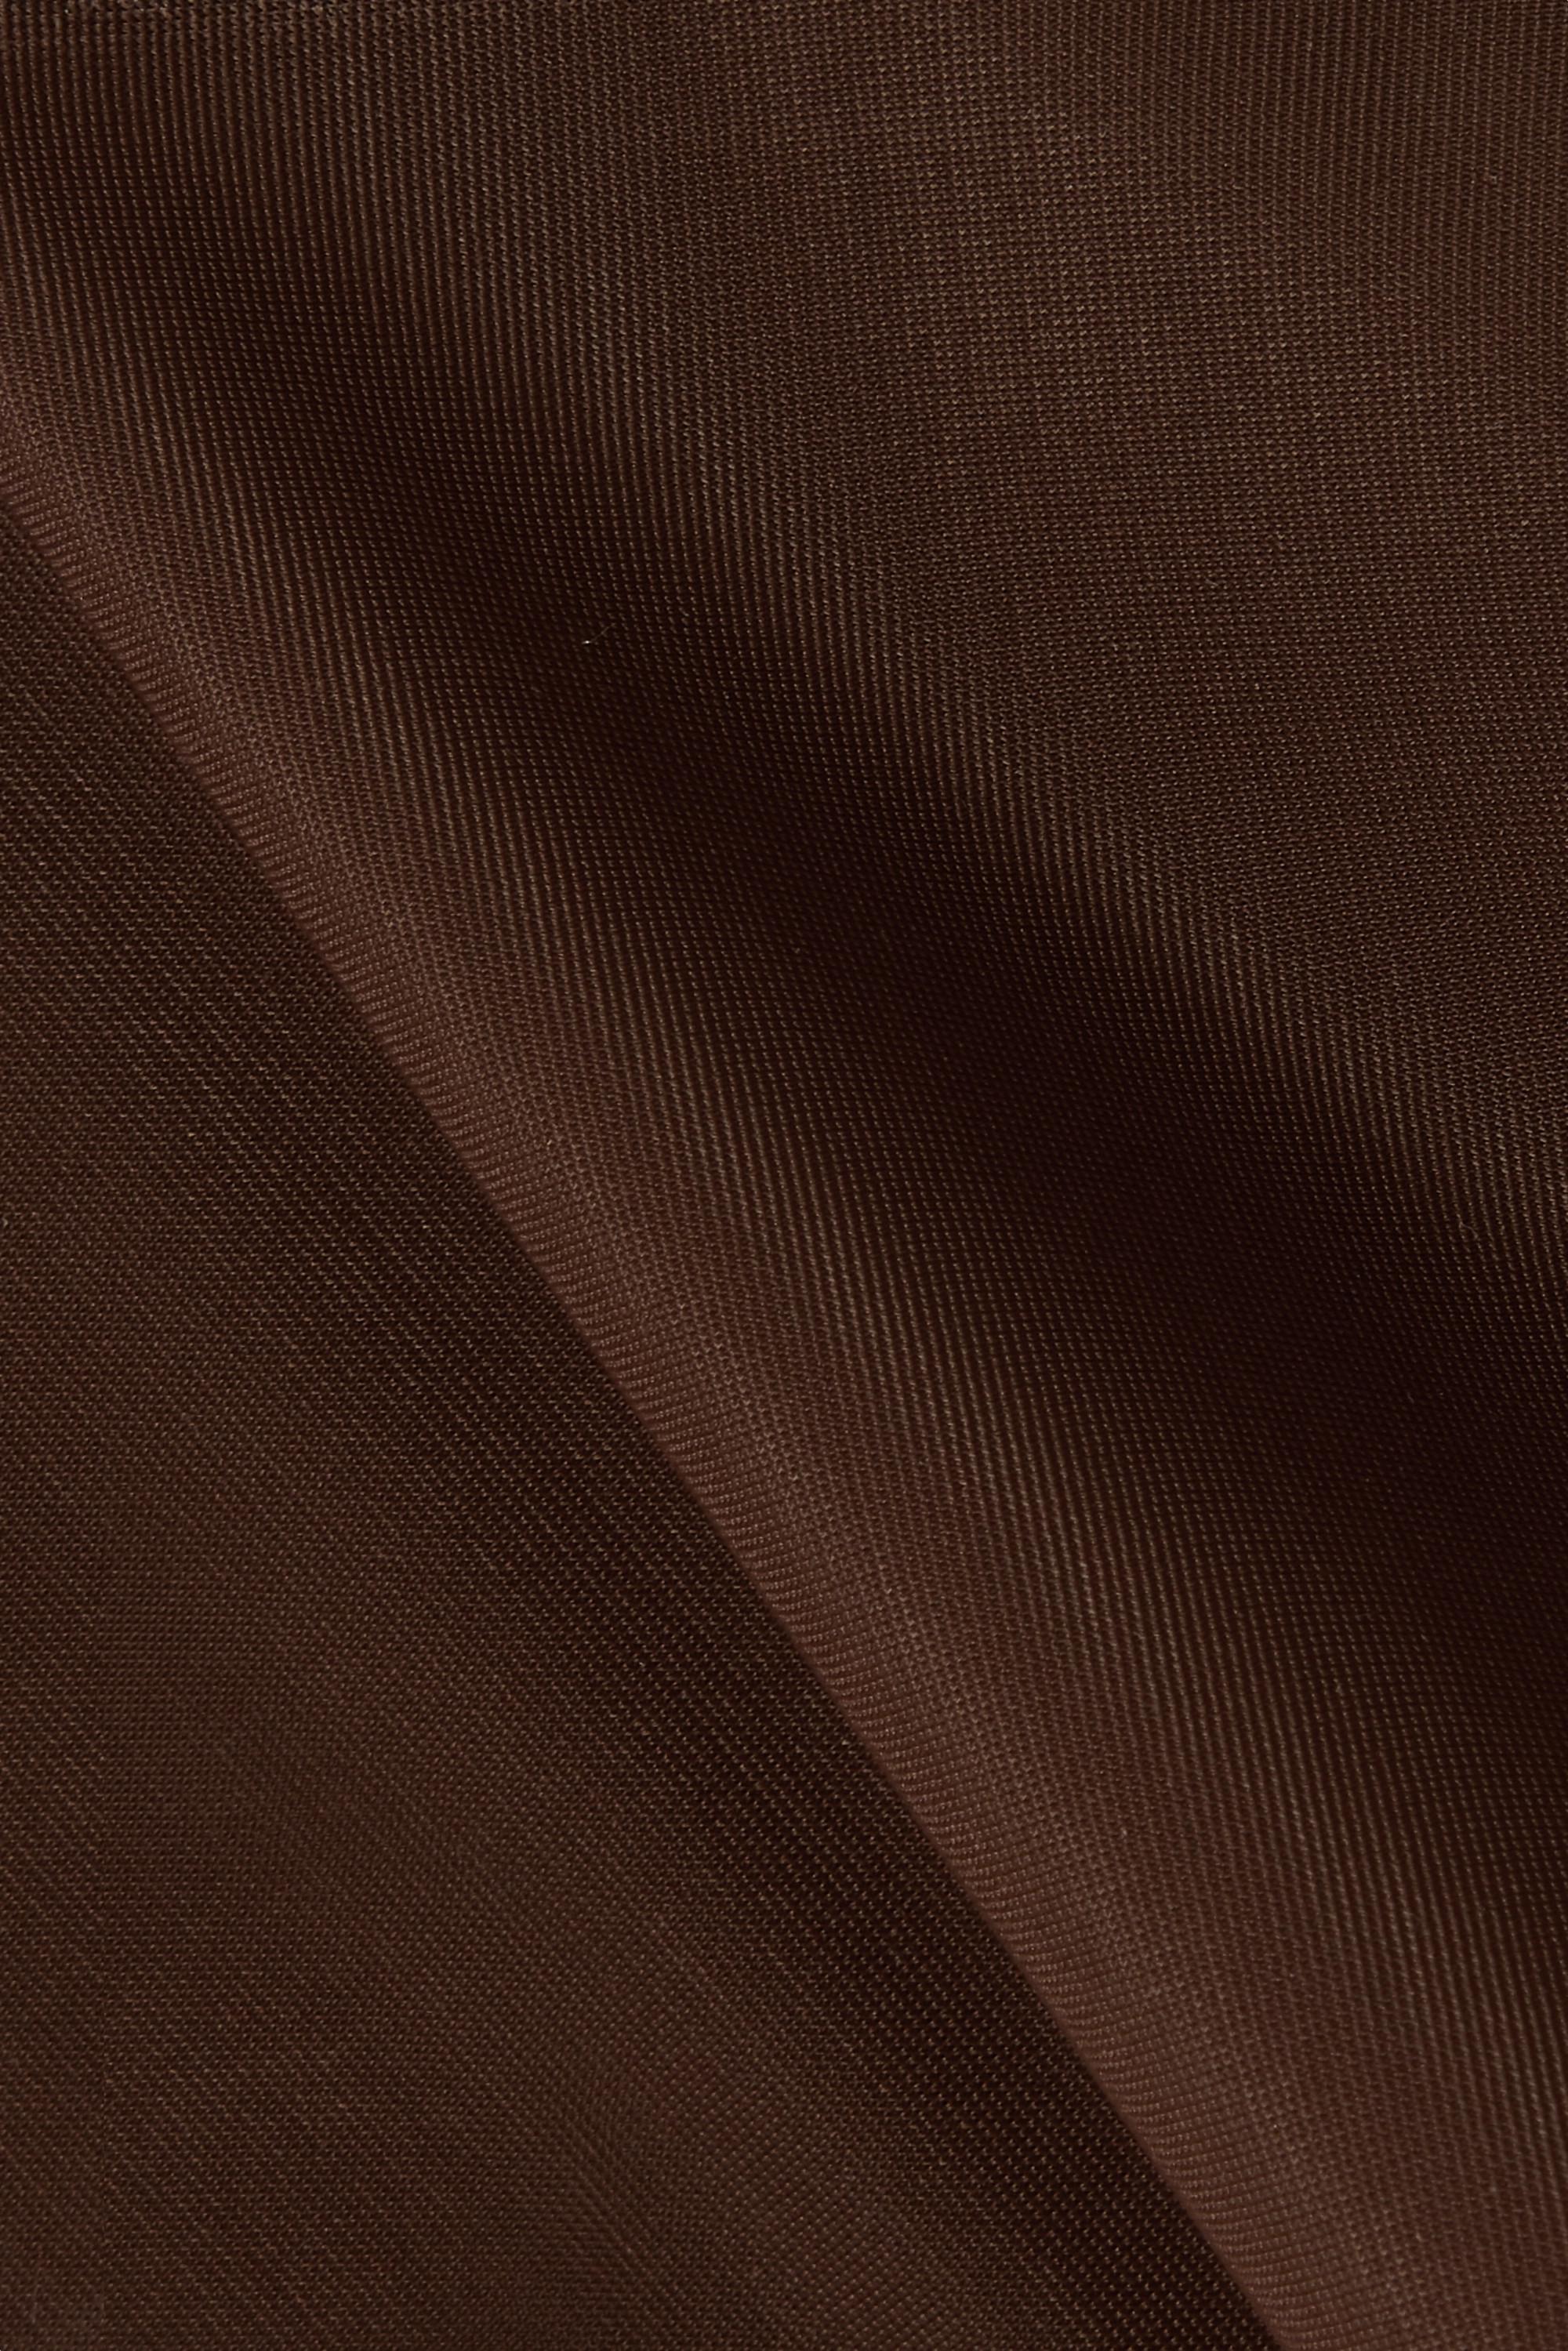 SKIMS Naked High Waisted thong - Smokey Quartz